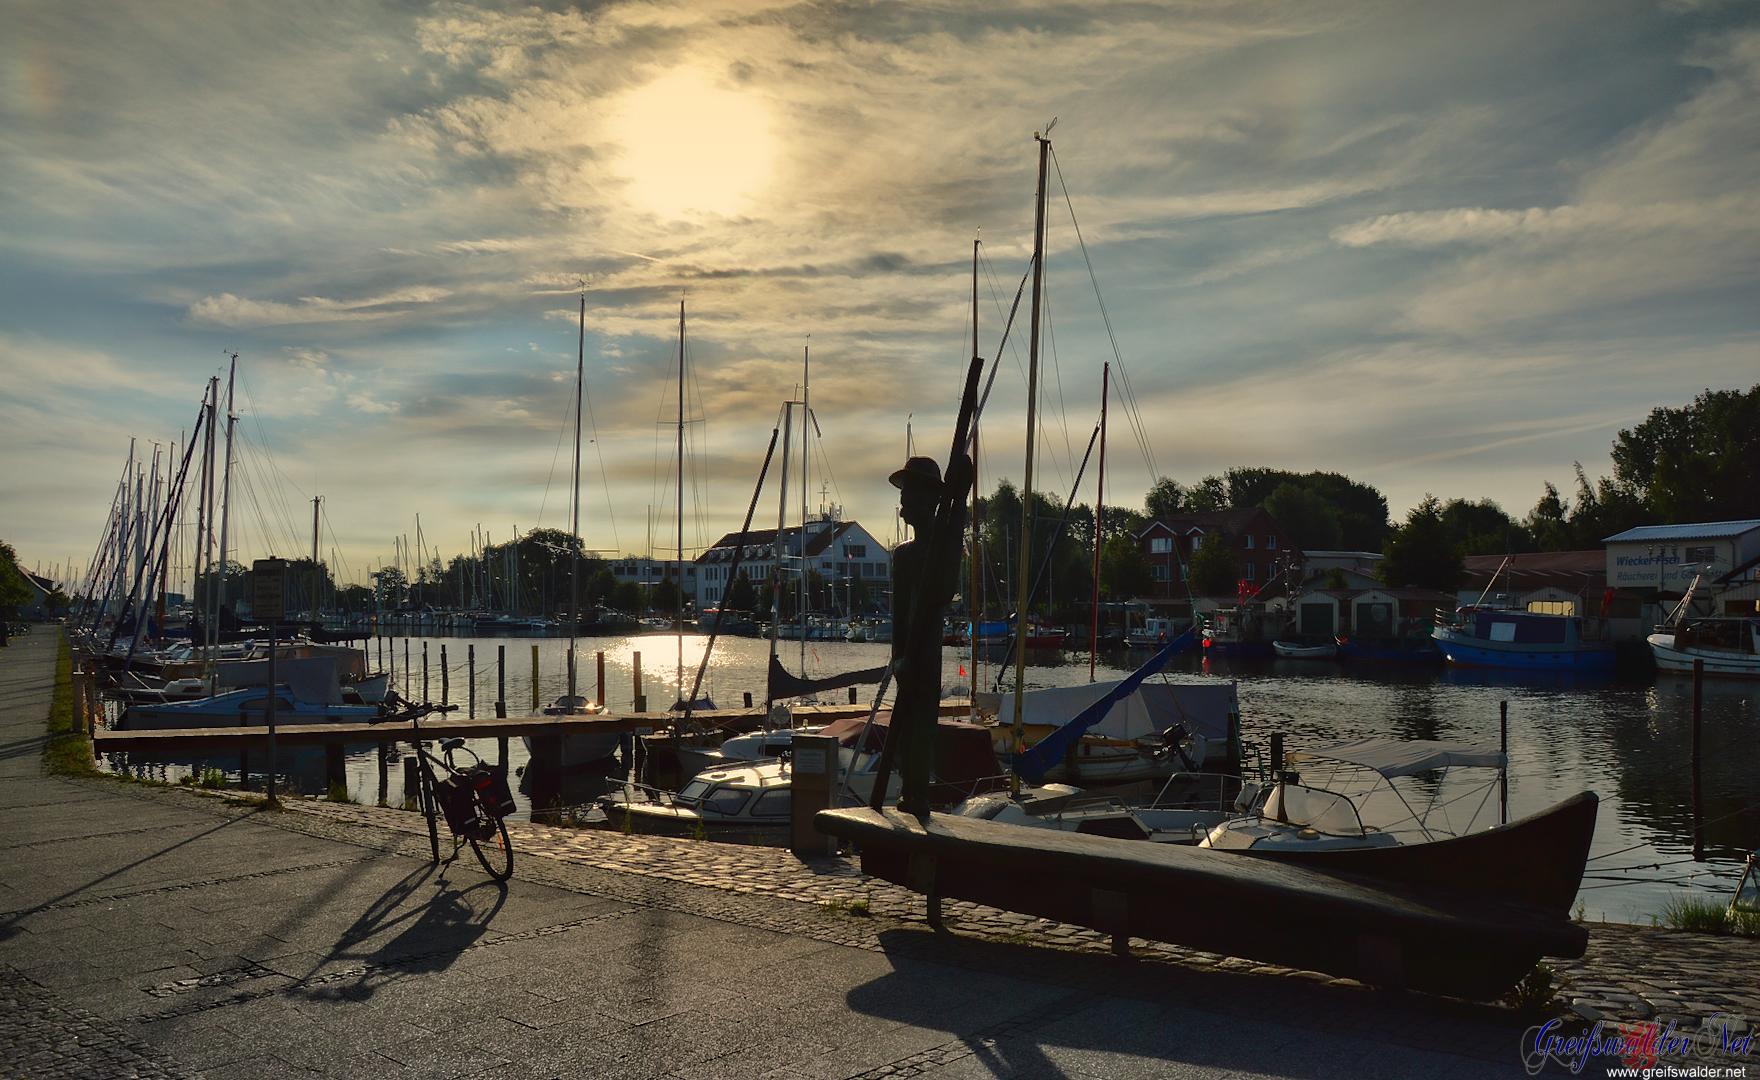 Montagmorgen in Greifswald-Wieck